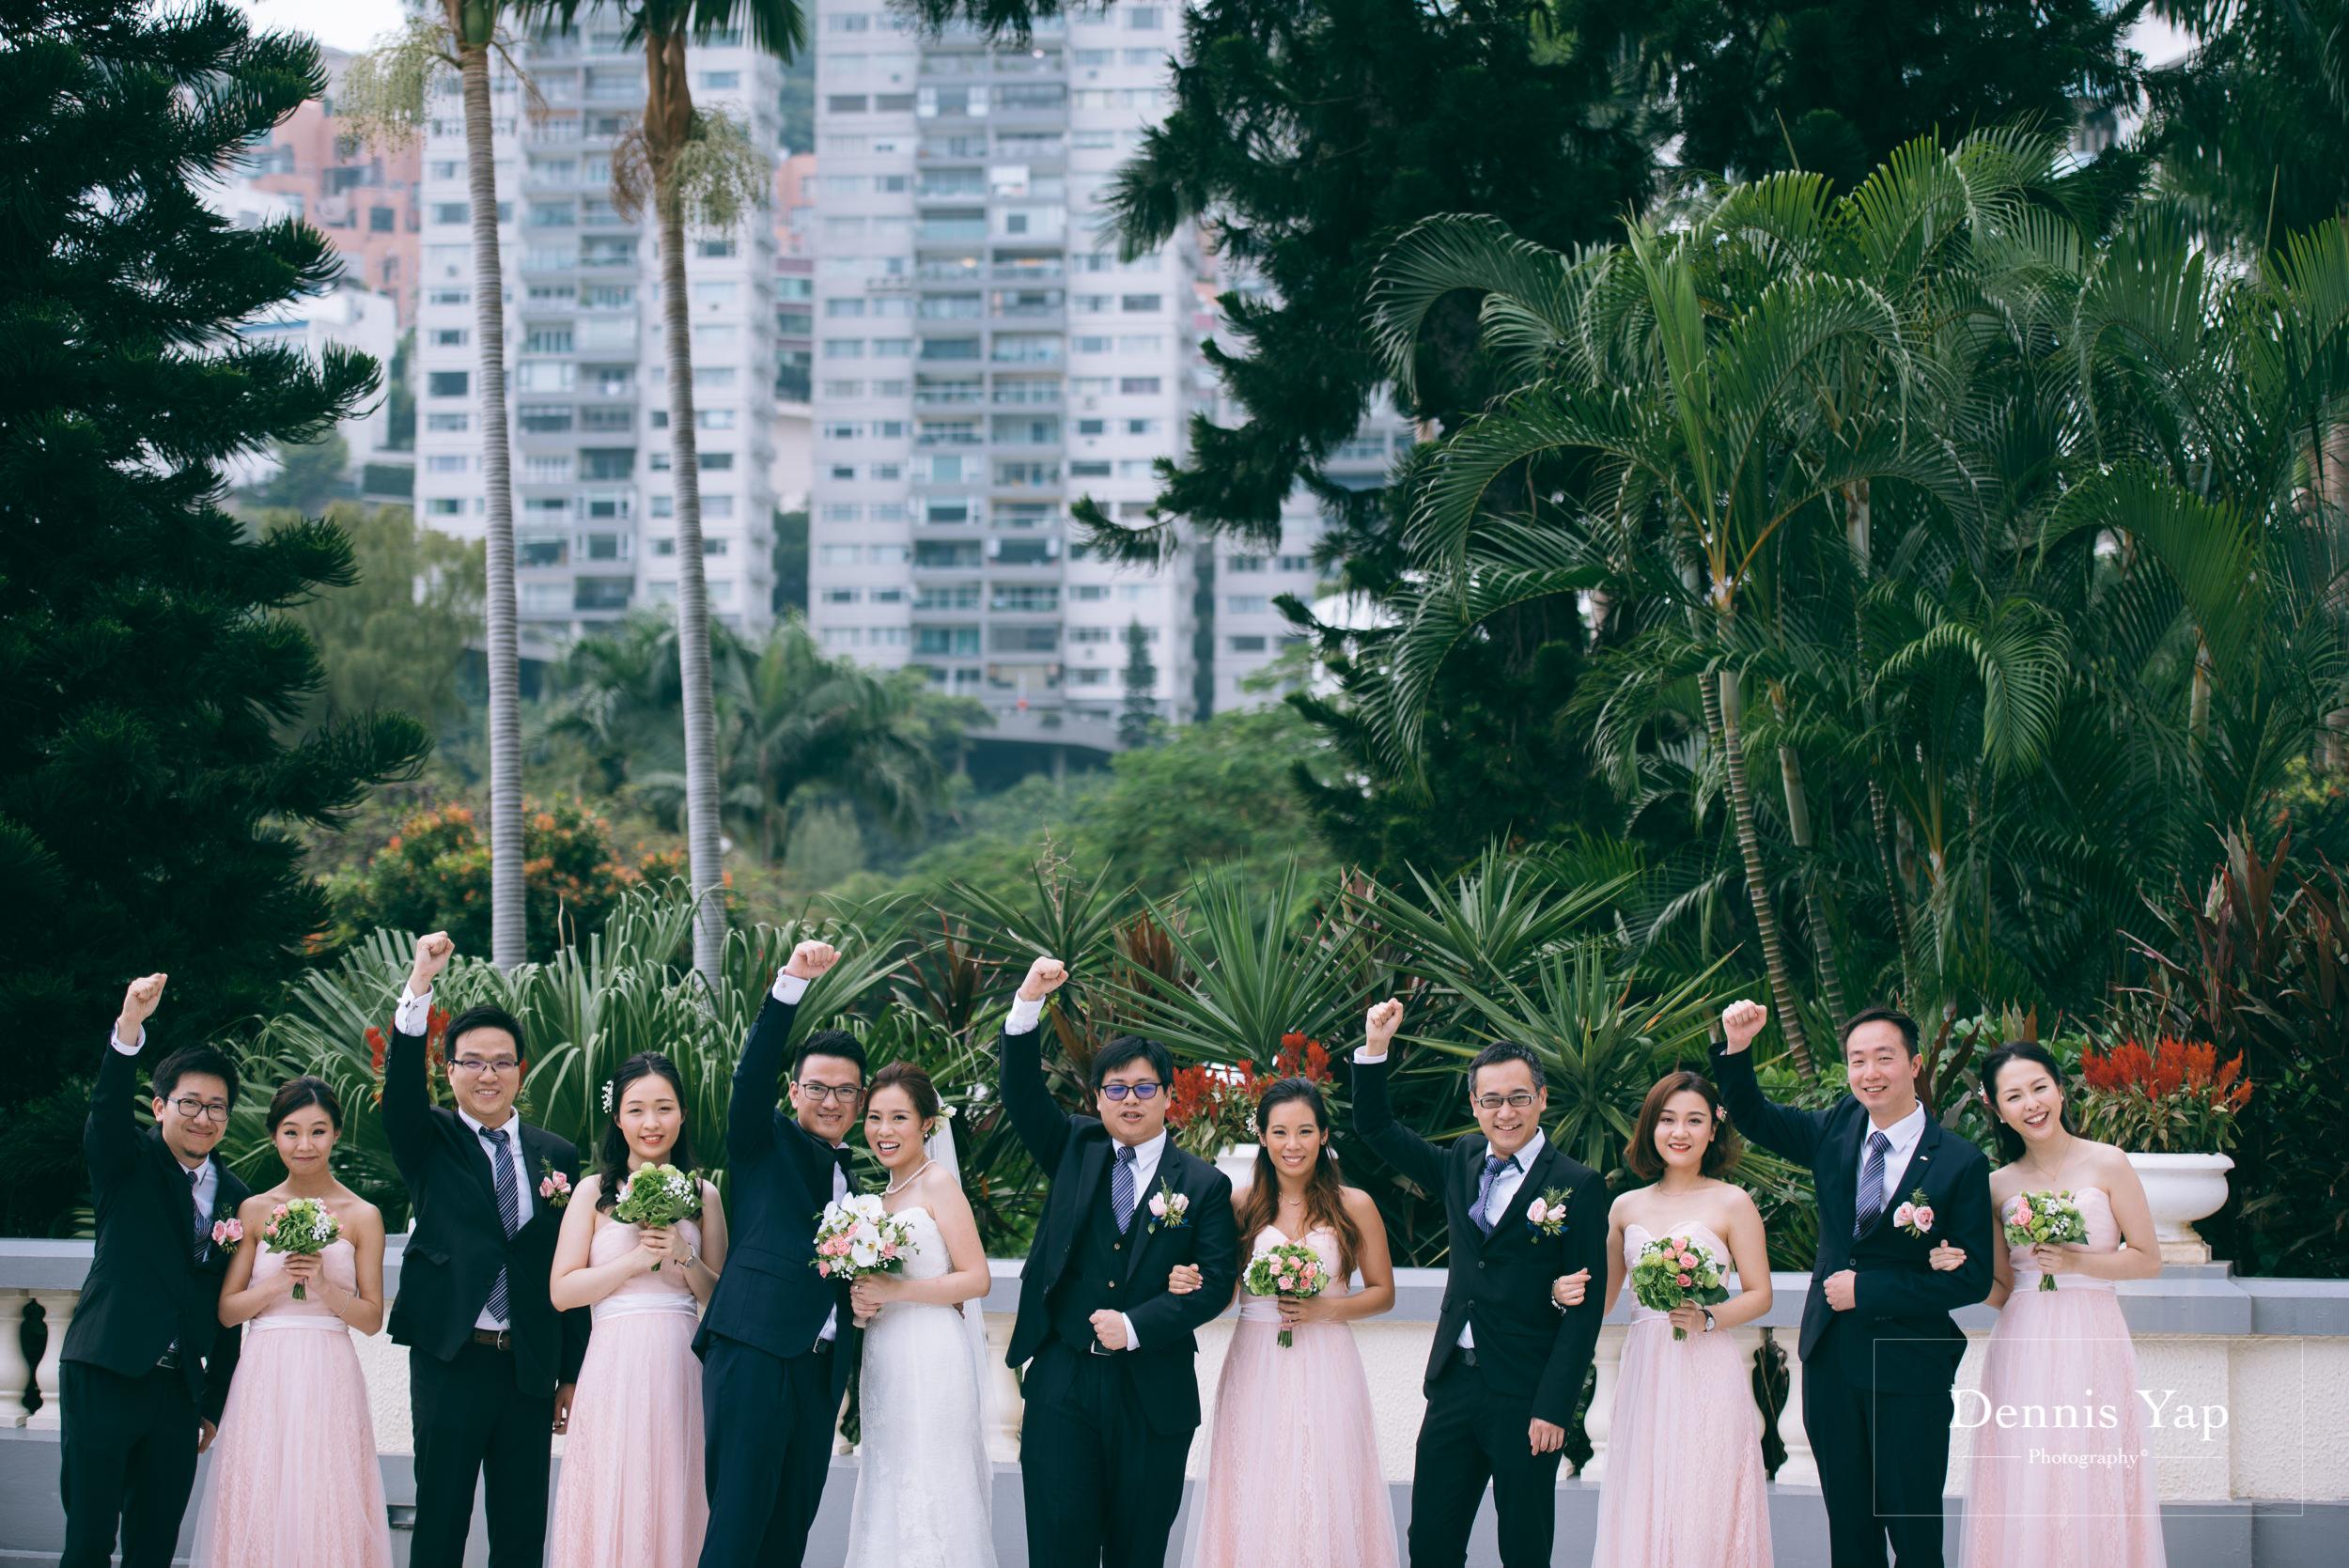 jason crystal wedding day gate crash hong kong garden wedding dennis yap photography-20.jpg